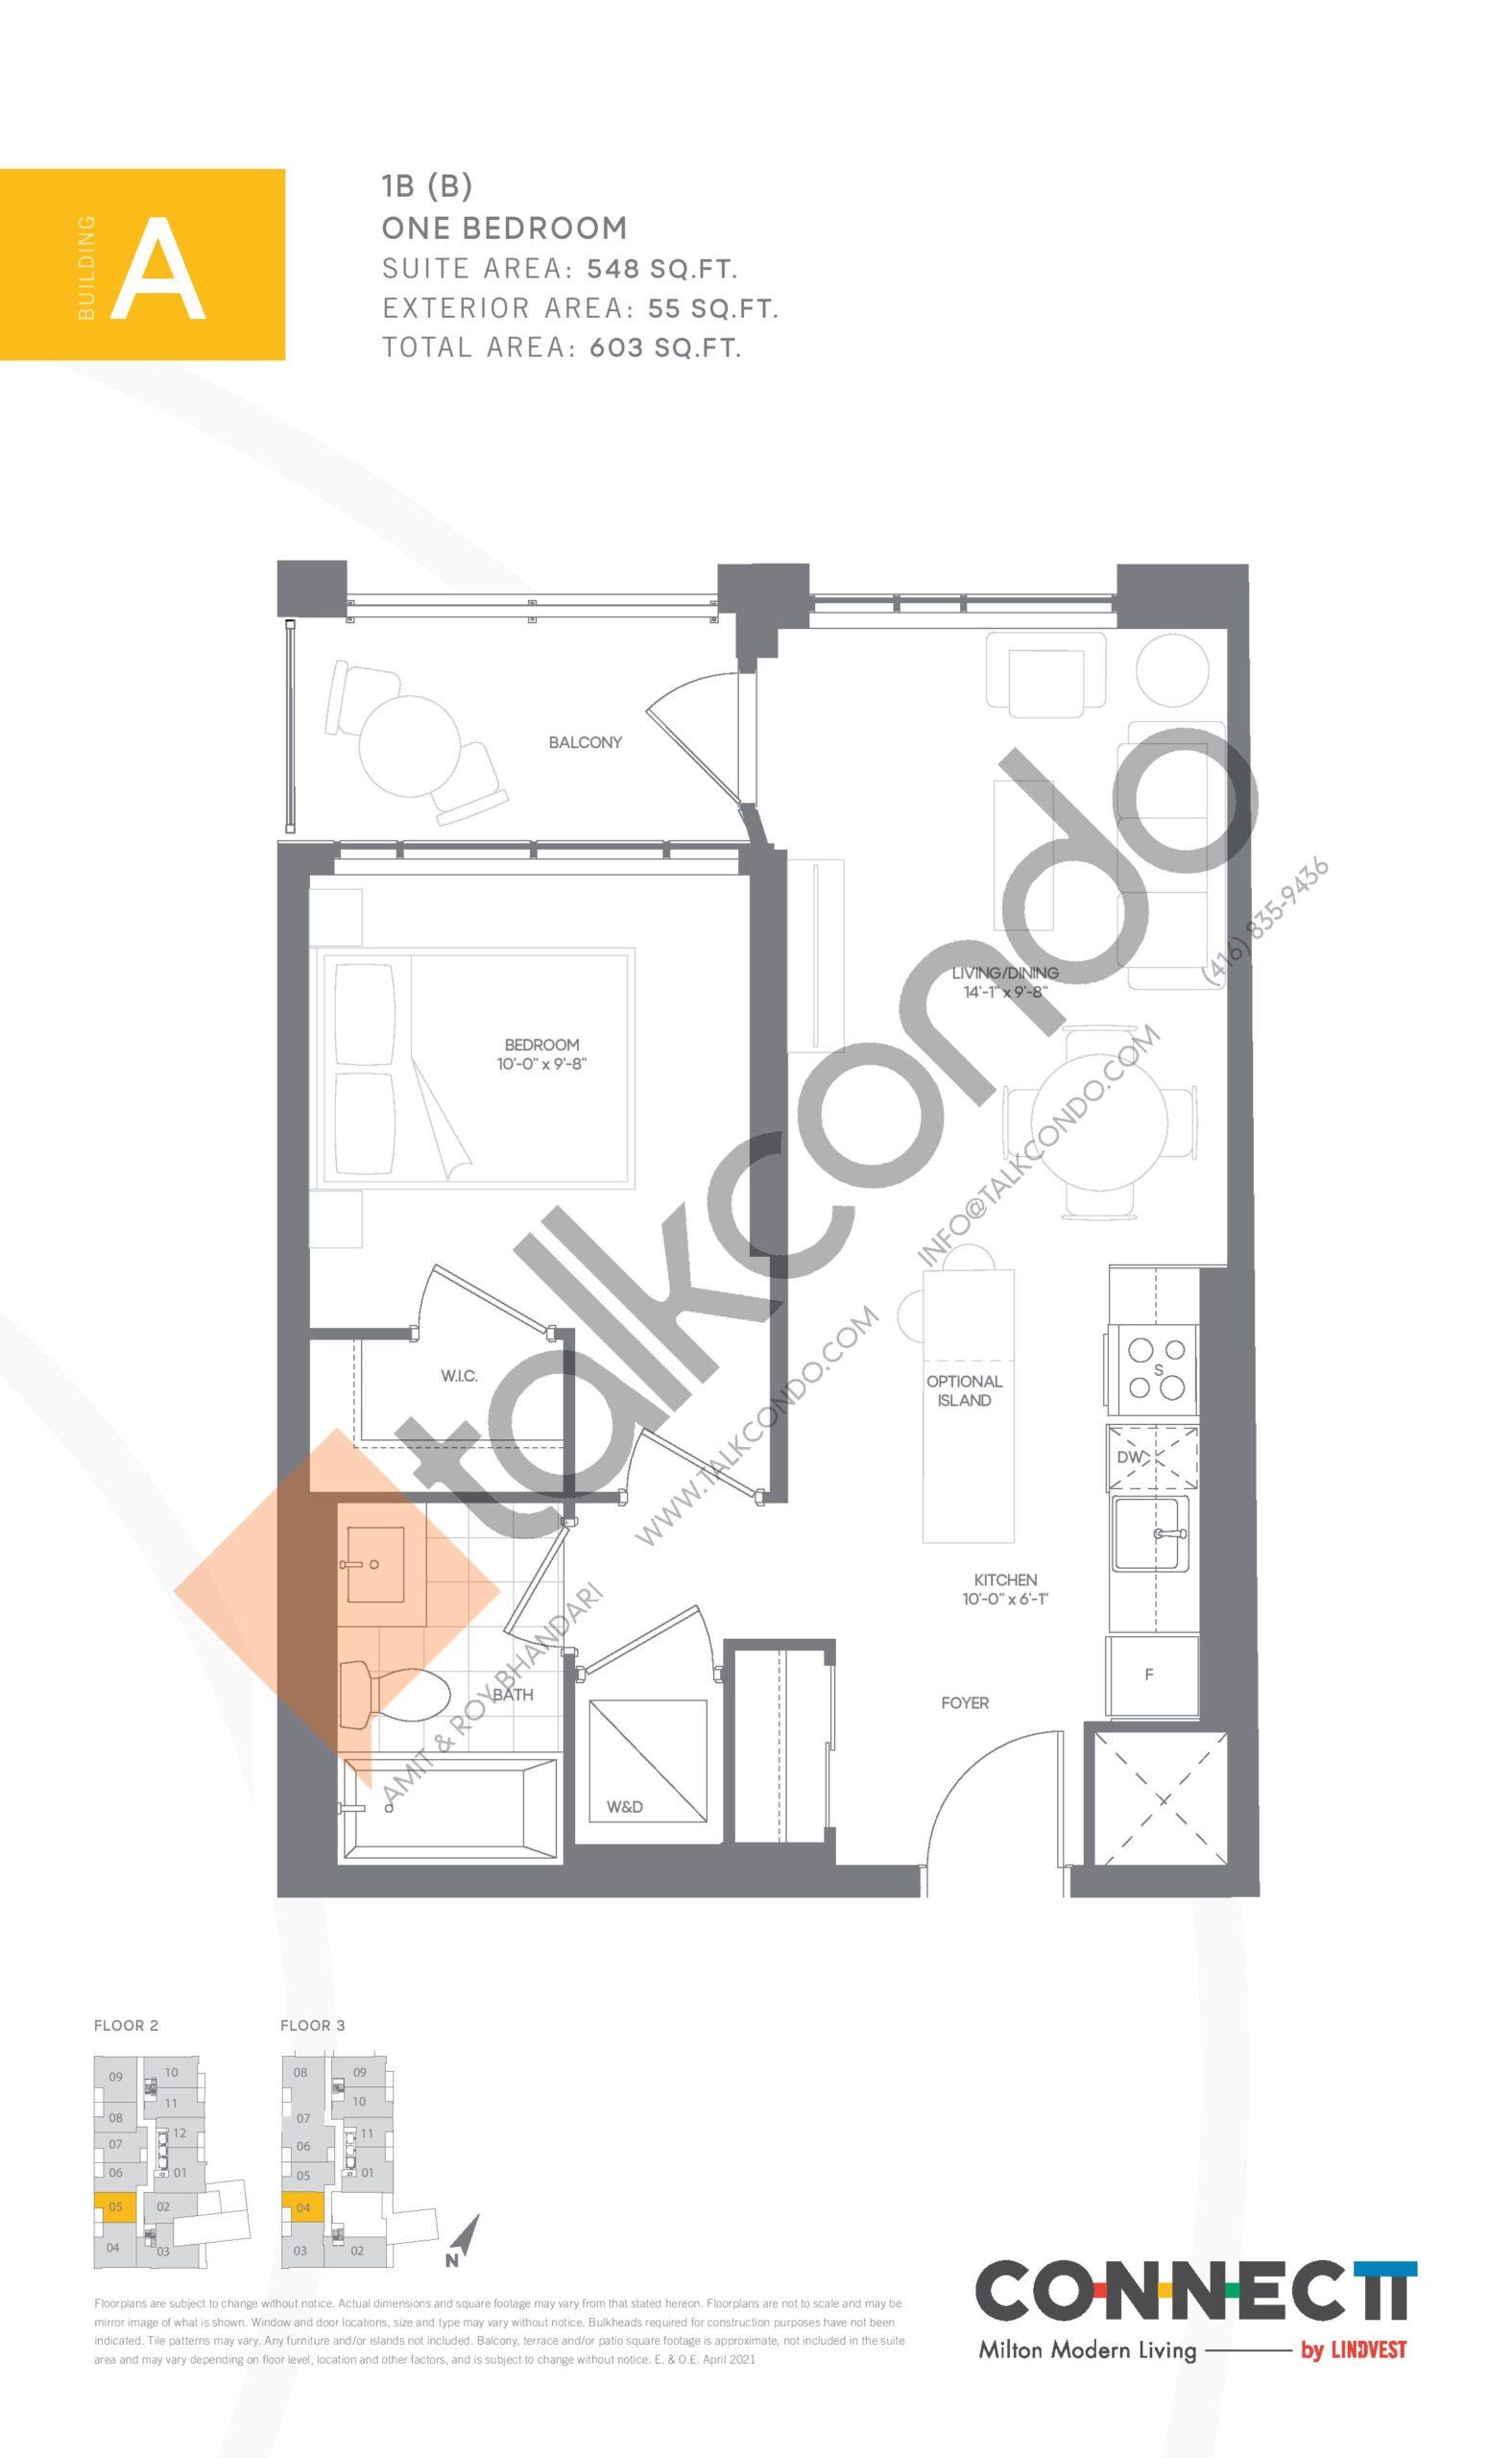 1B (B) Floor Plan at Connectt Urban Community Condos - 548 sq.ft